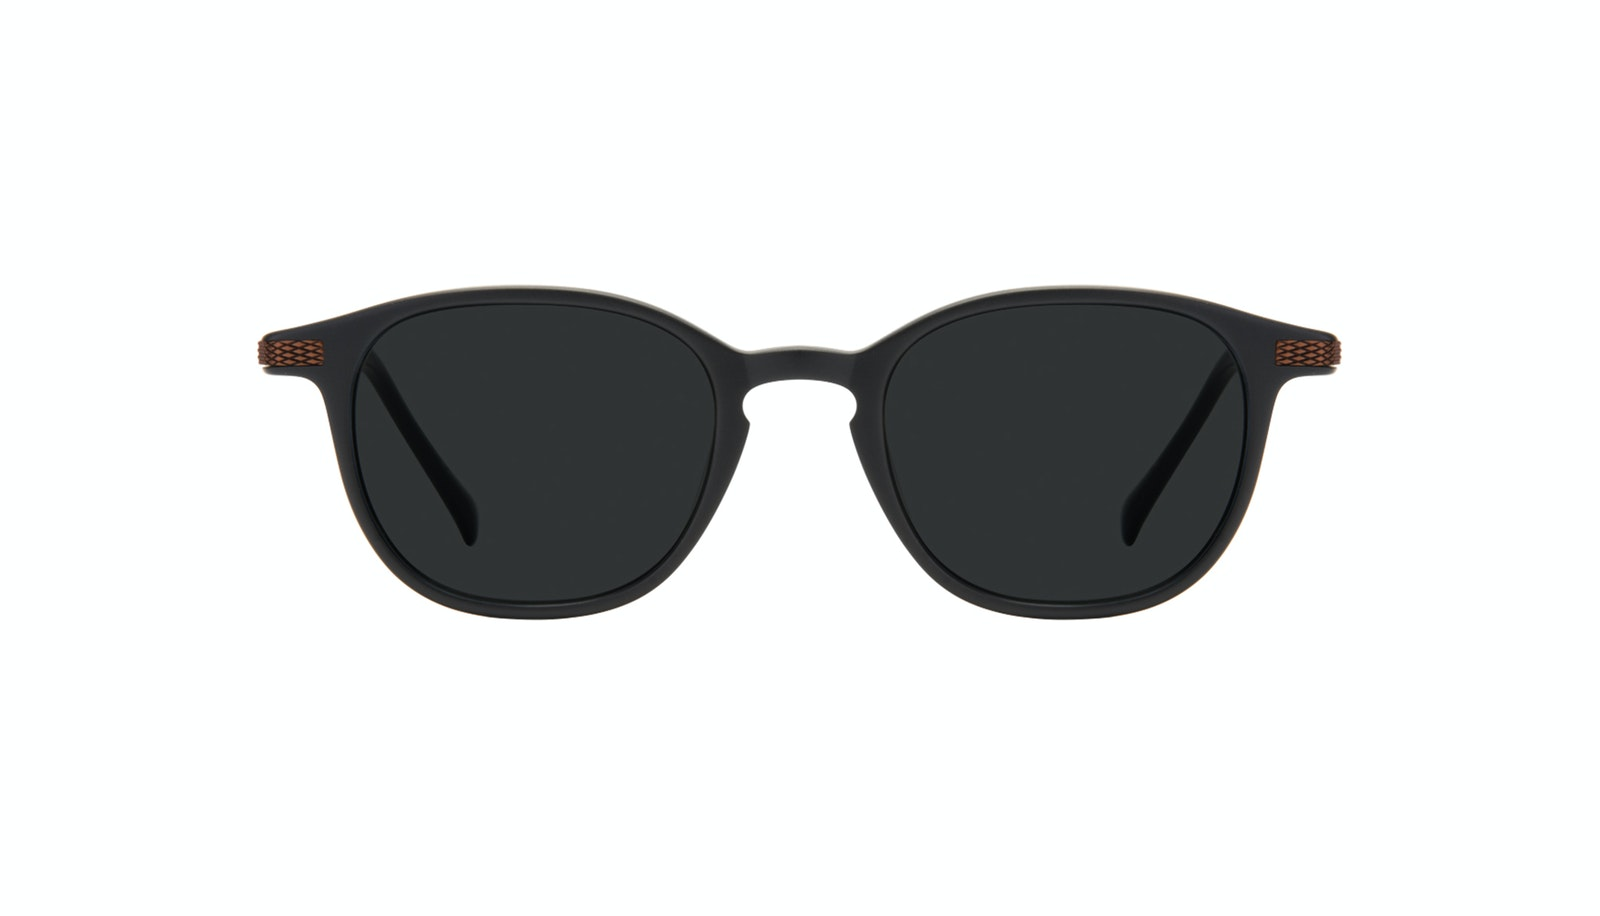 Affordable Fashion Glasses Round Sunglasses Men Tux Onyx Matte